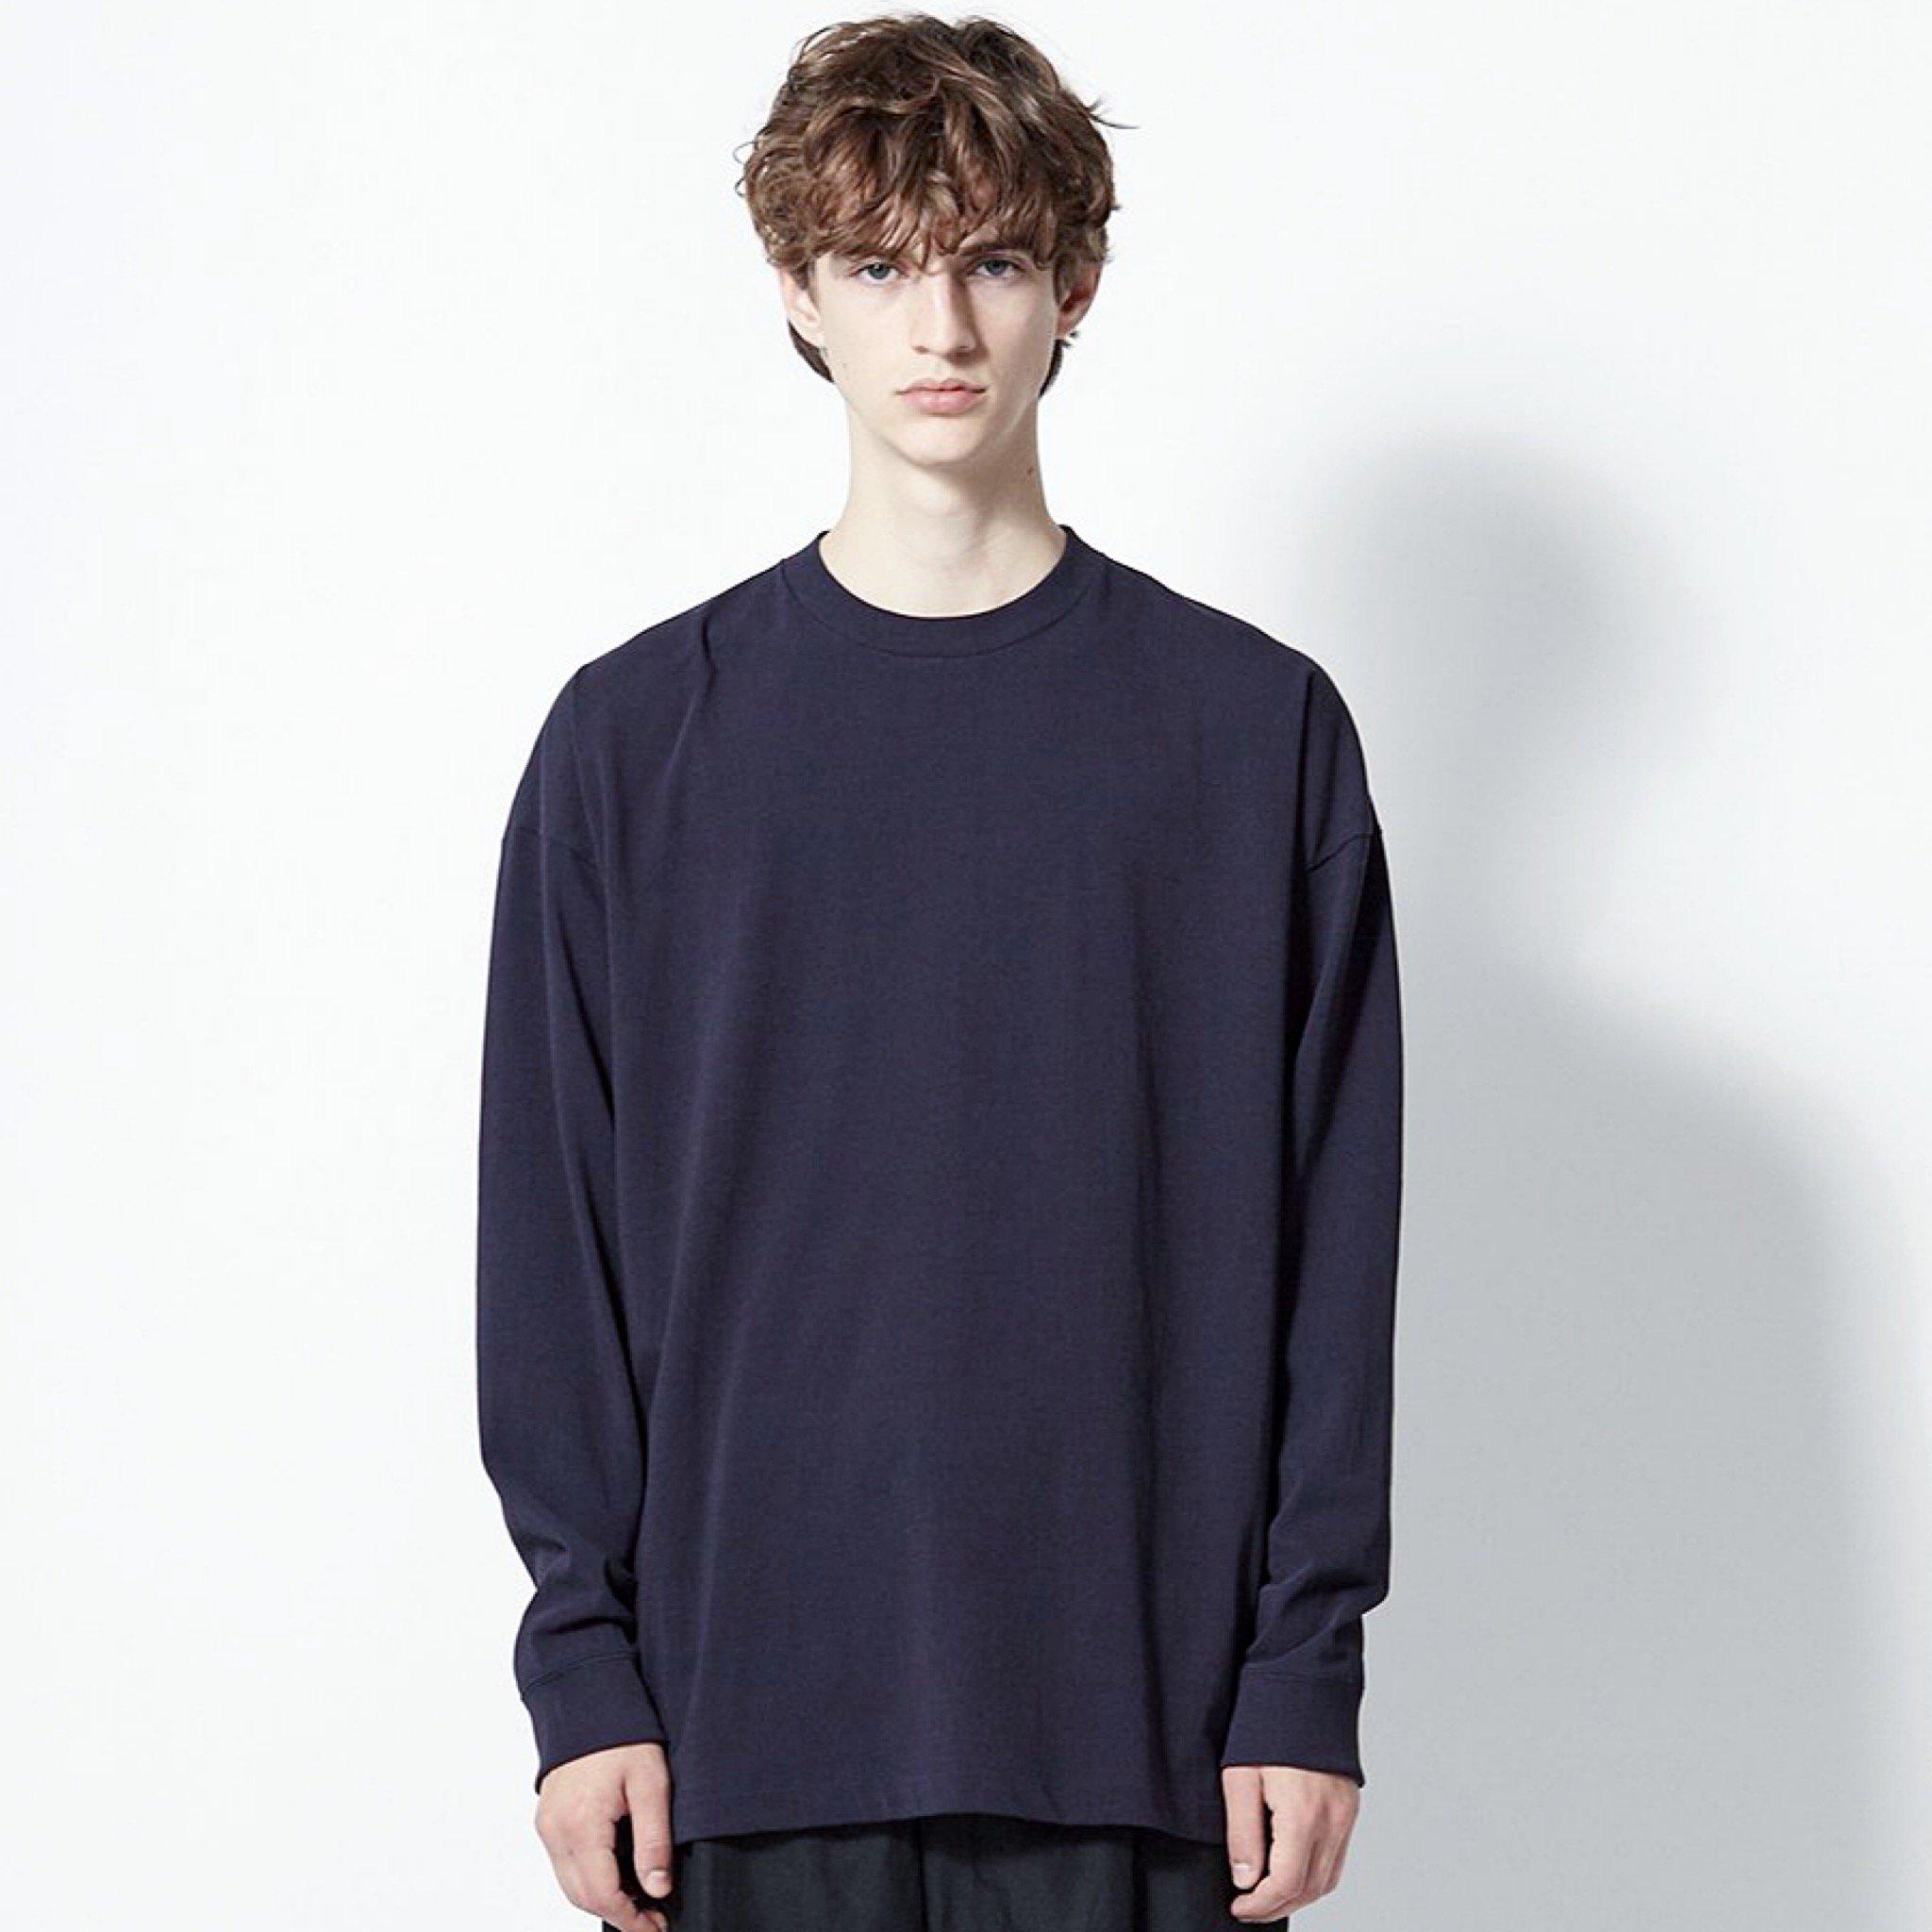 【ATON】<br> フレスカ プレート オーバーサイズ <br>ロングスリーブ Tシャツ